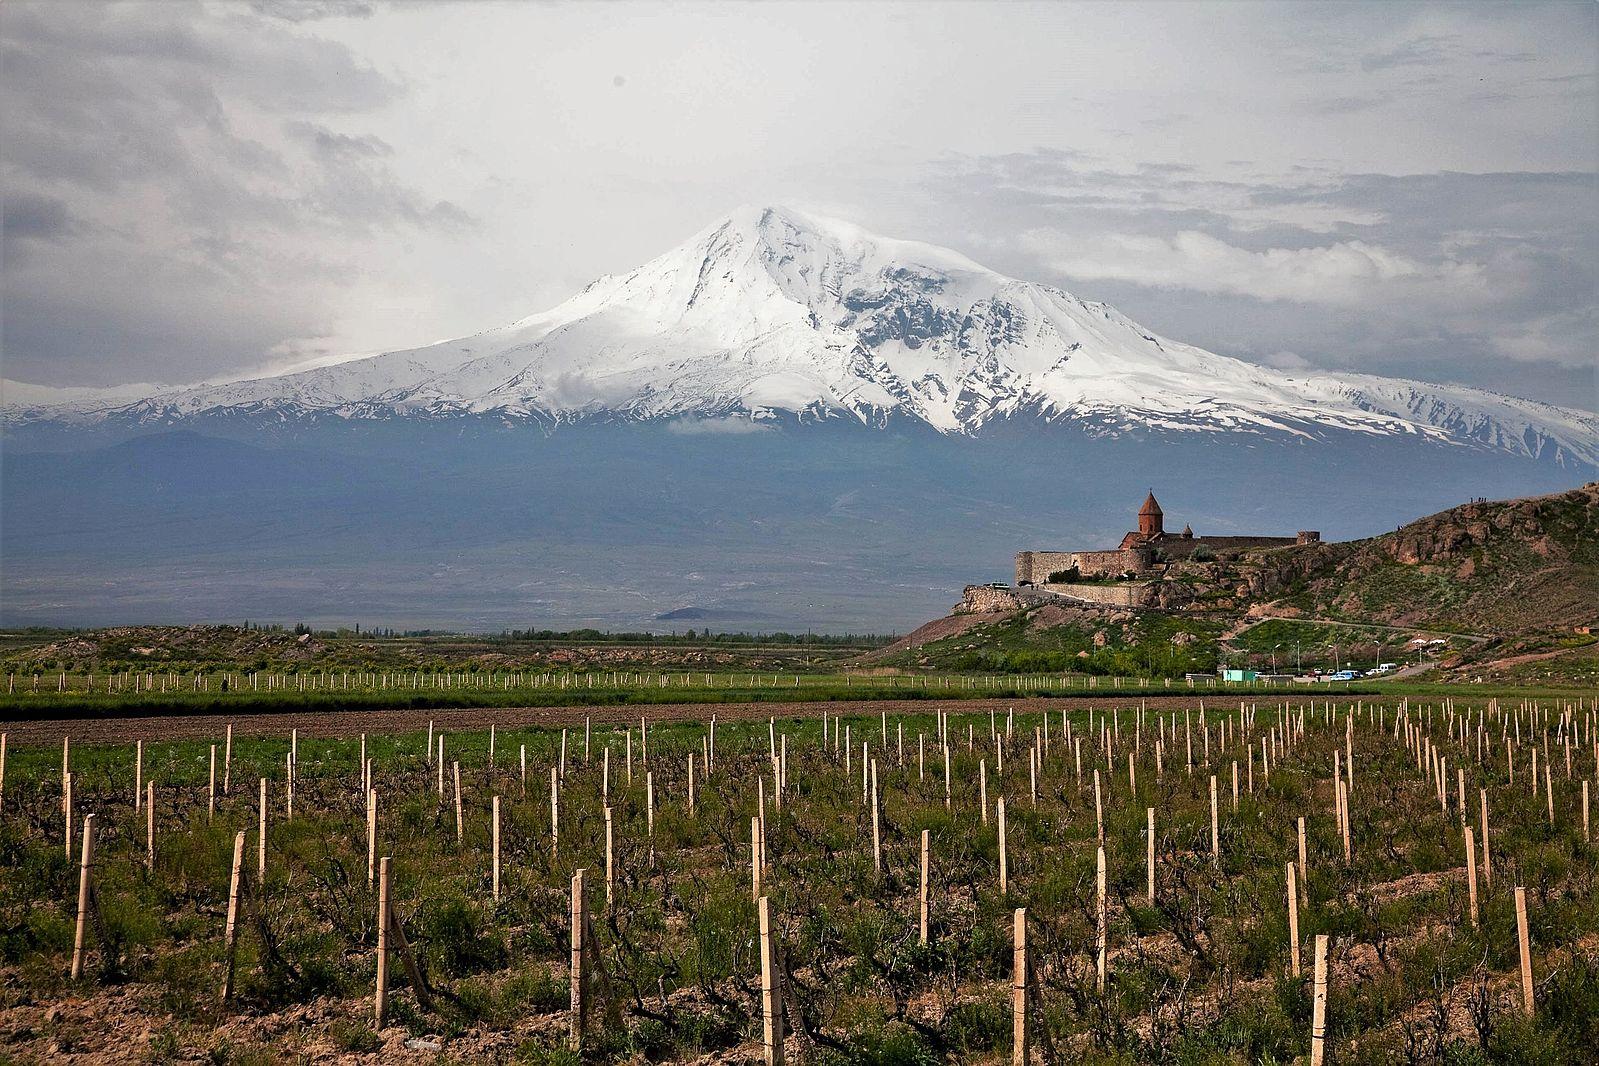 Armenia wine vineyard. Mount Ararat in the background